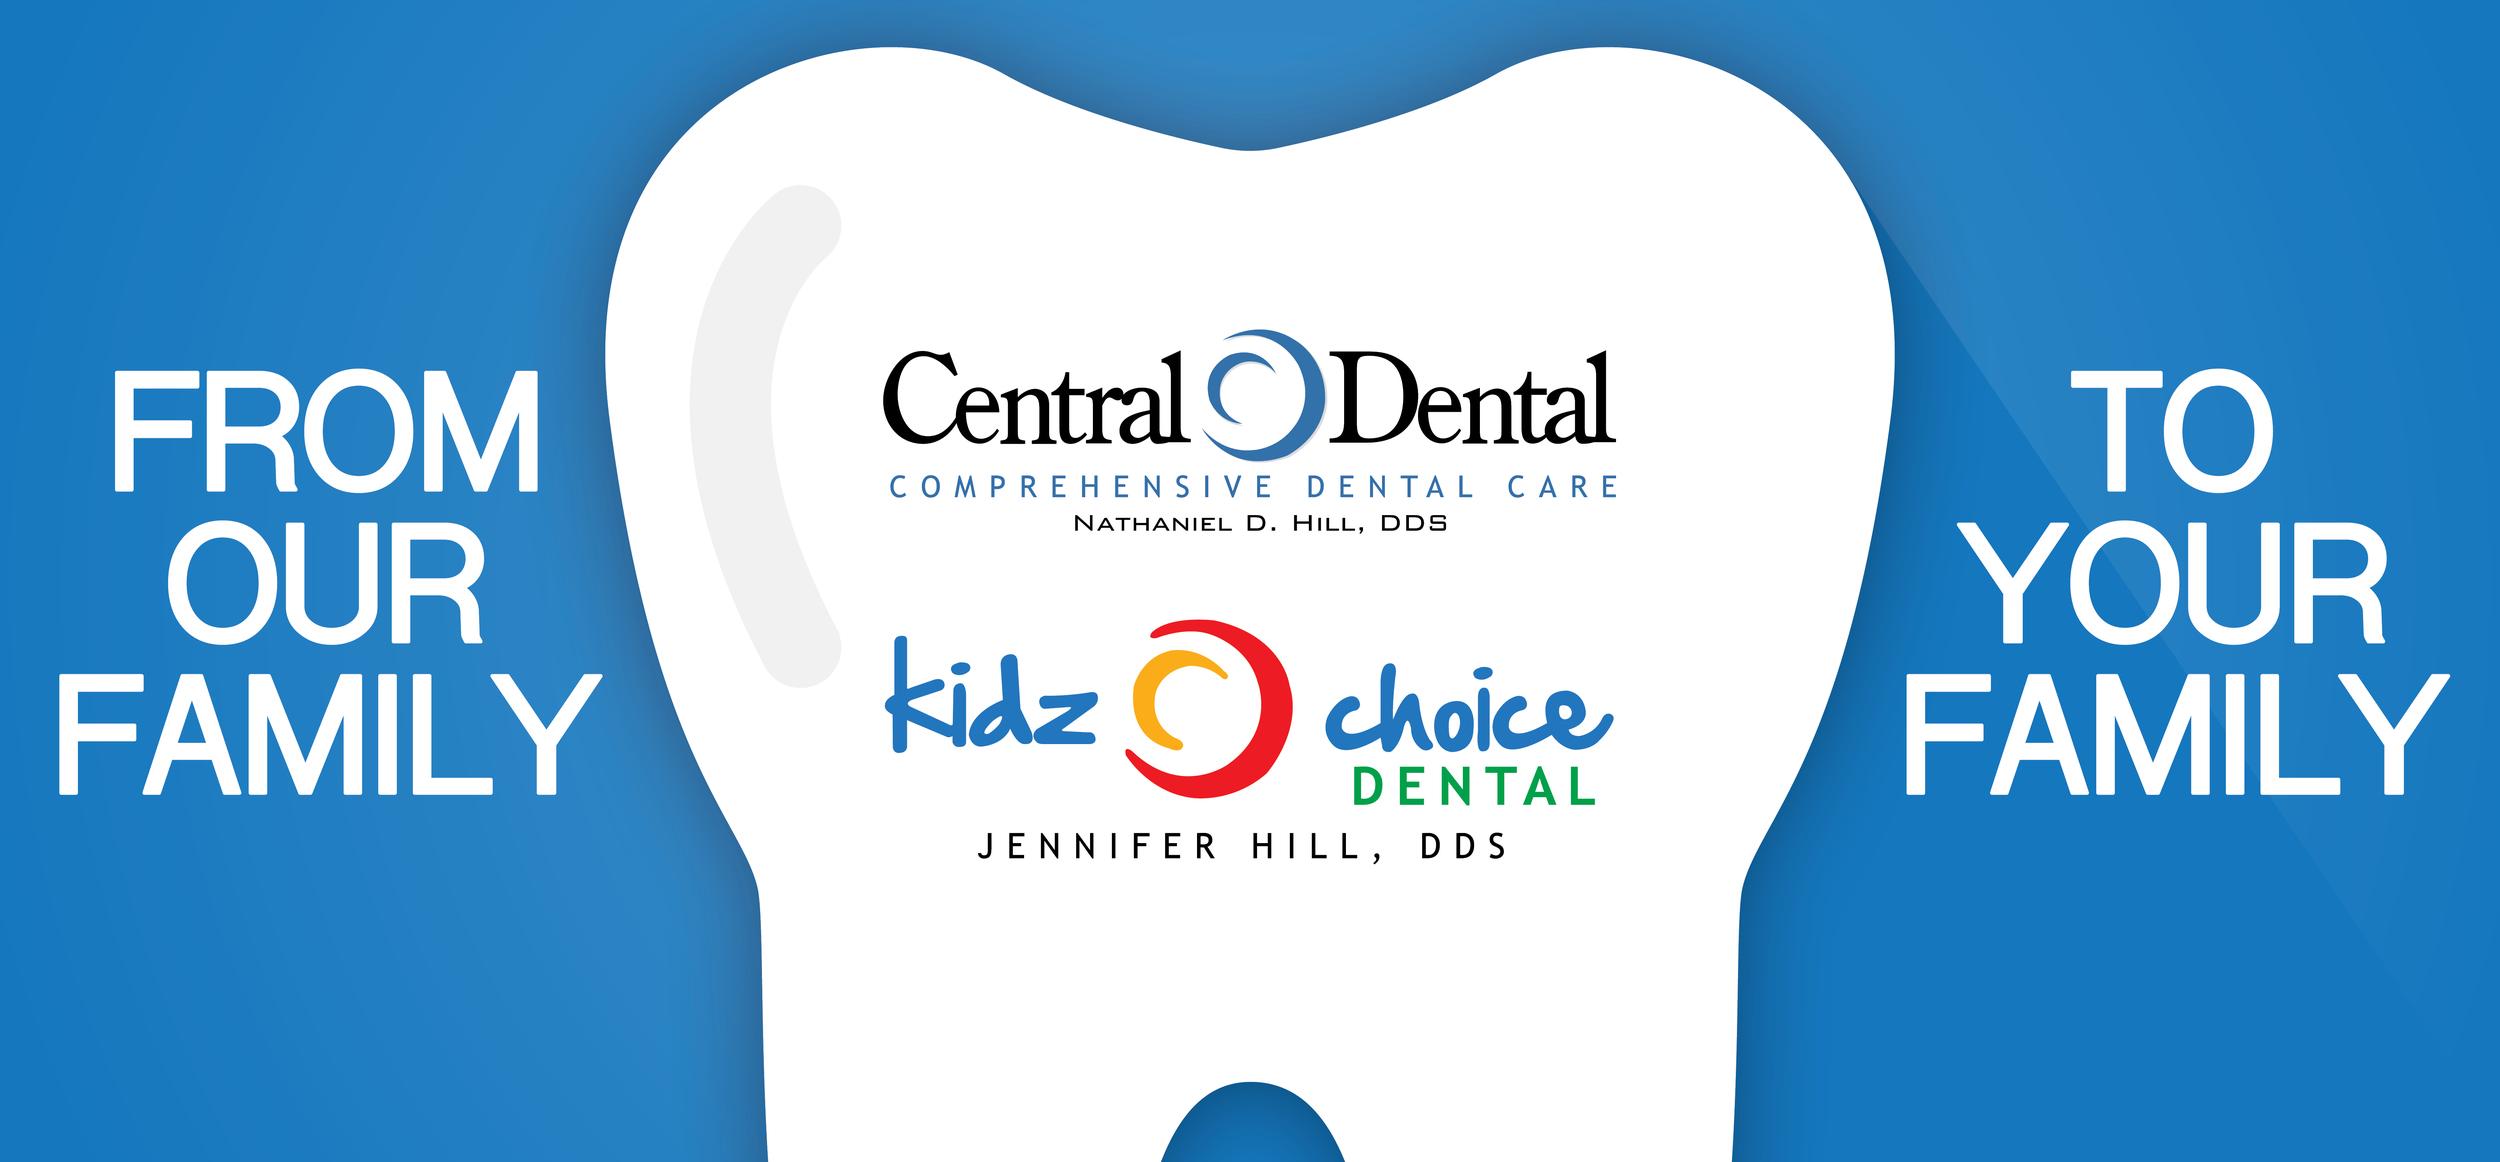 Central Dental Billboard Samples5.jpg